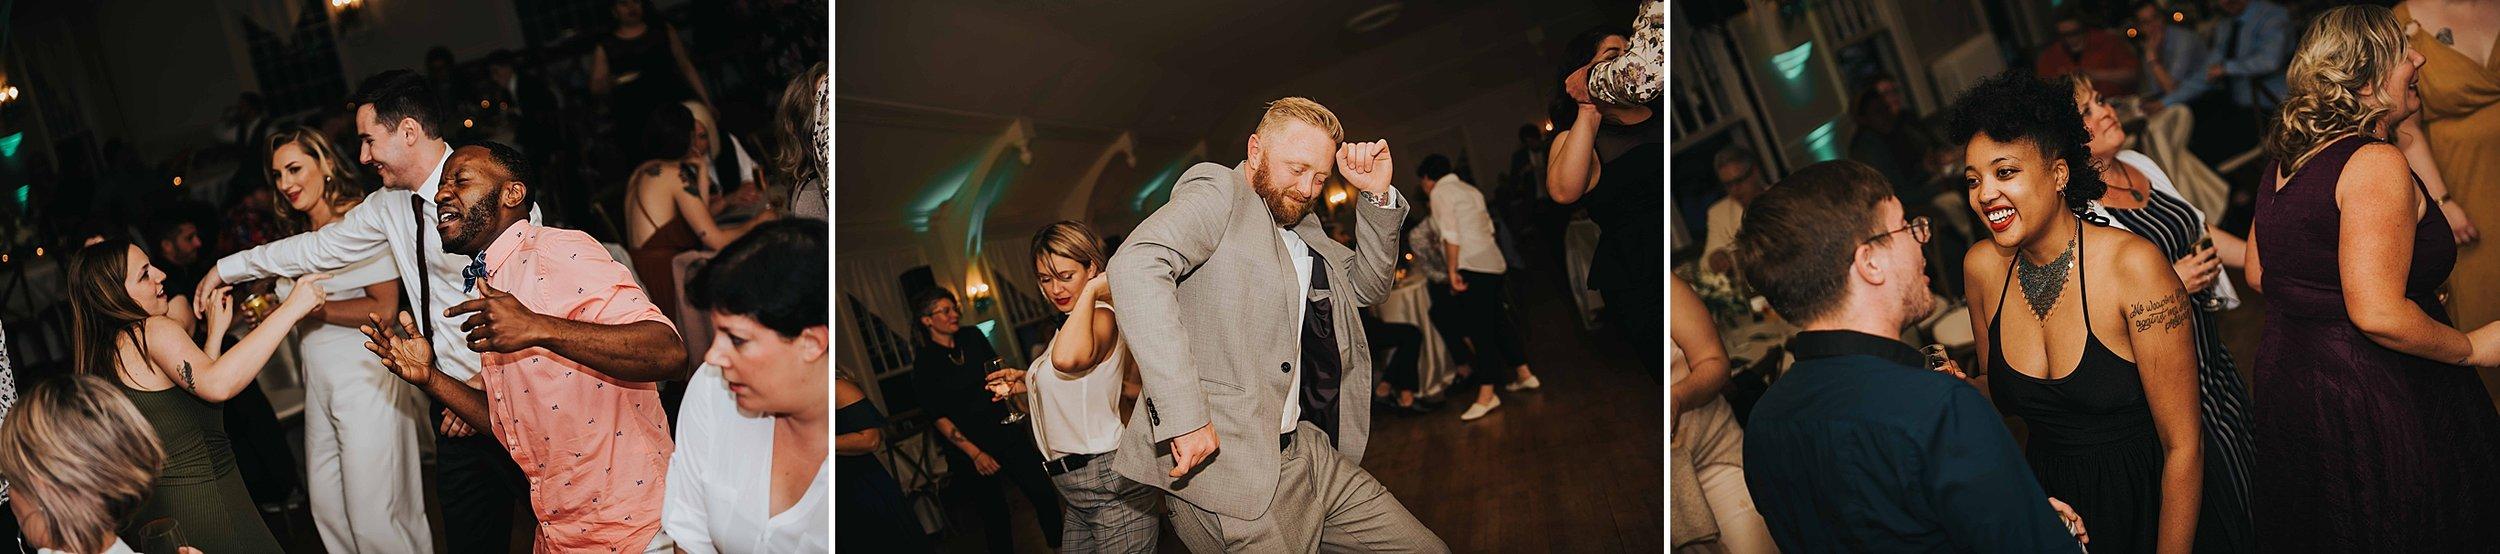 Seattle-Wedding-photographer-J HODGES PHOTOGRAPHY_0335.jpg